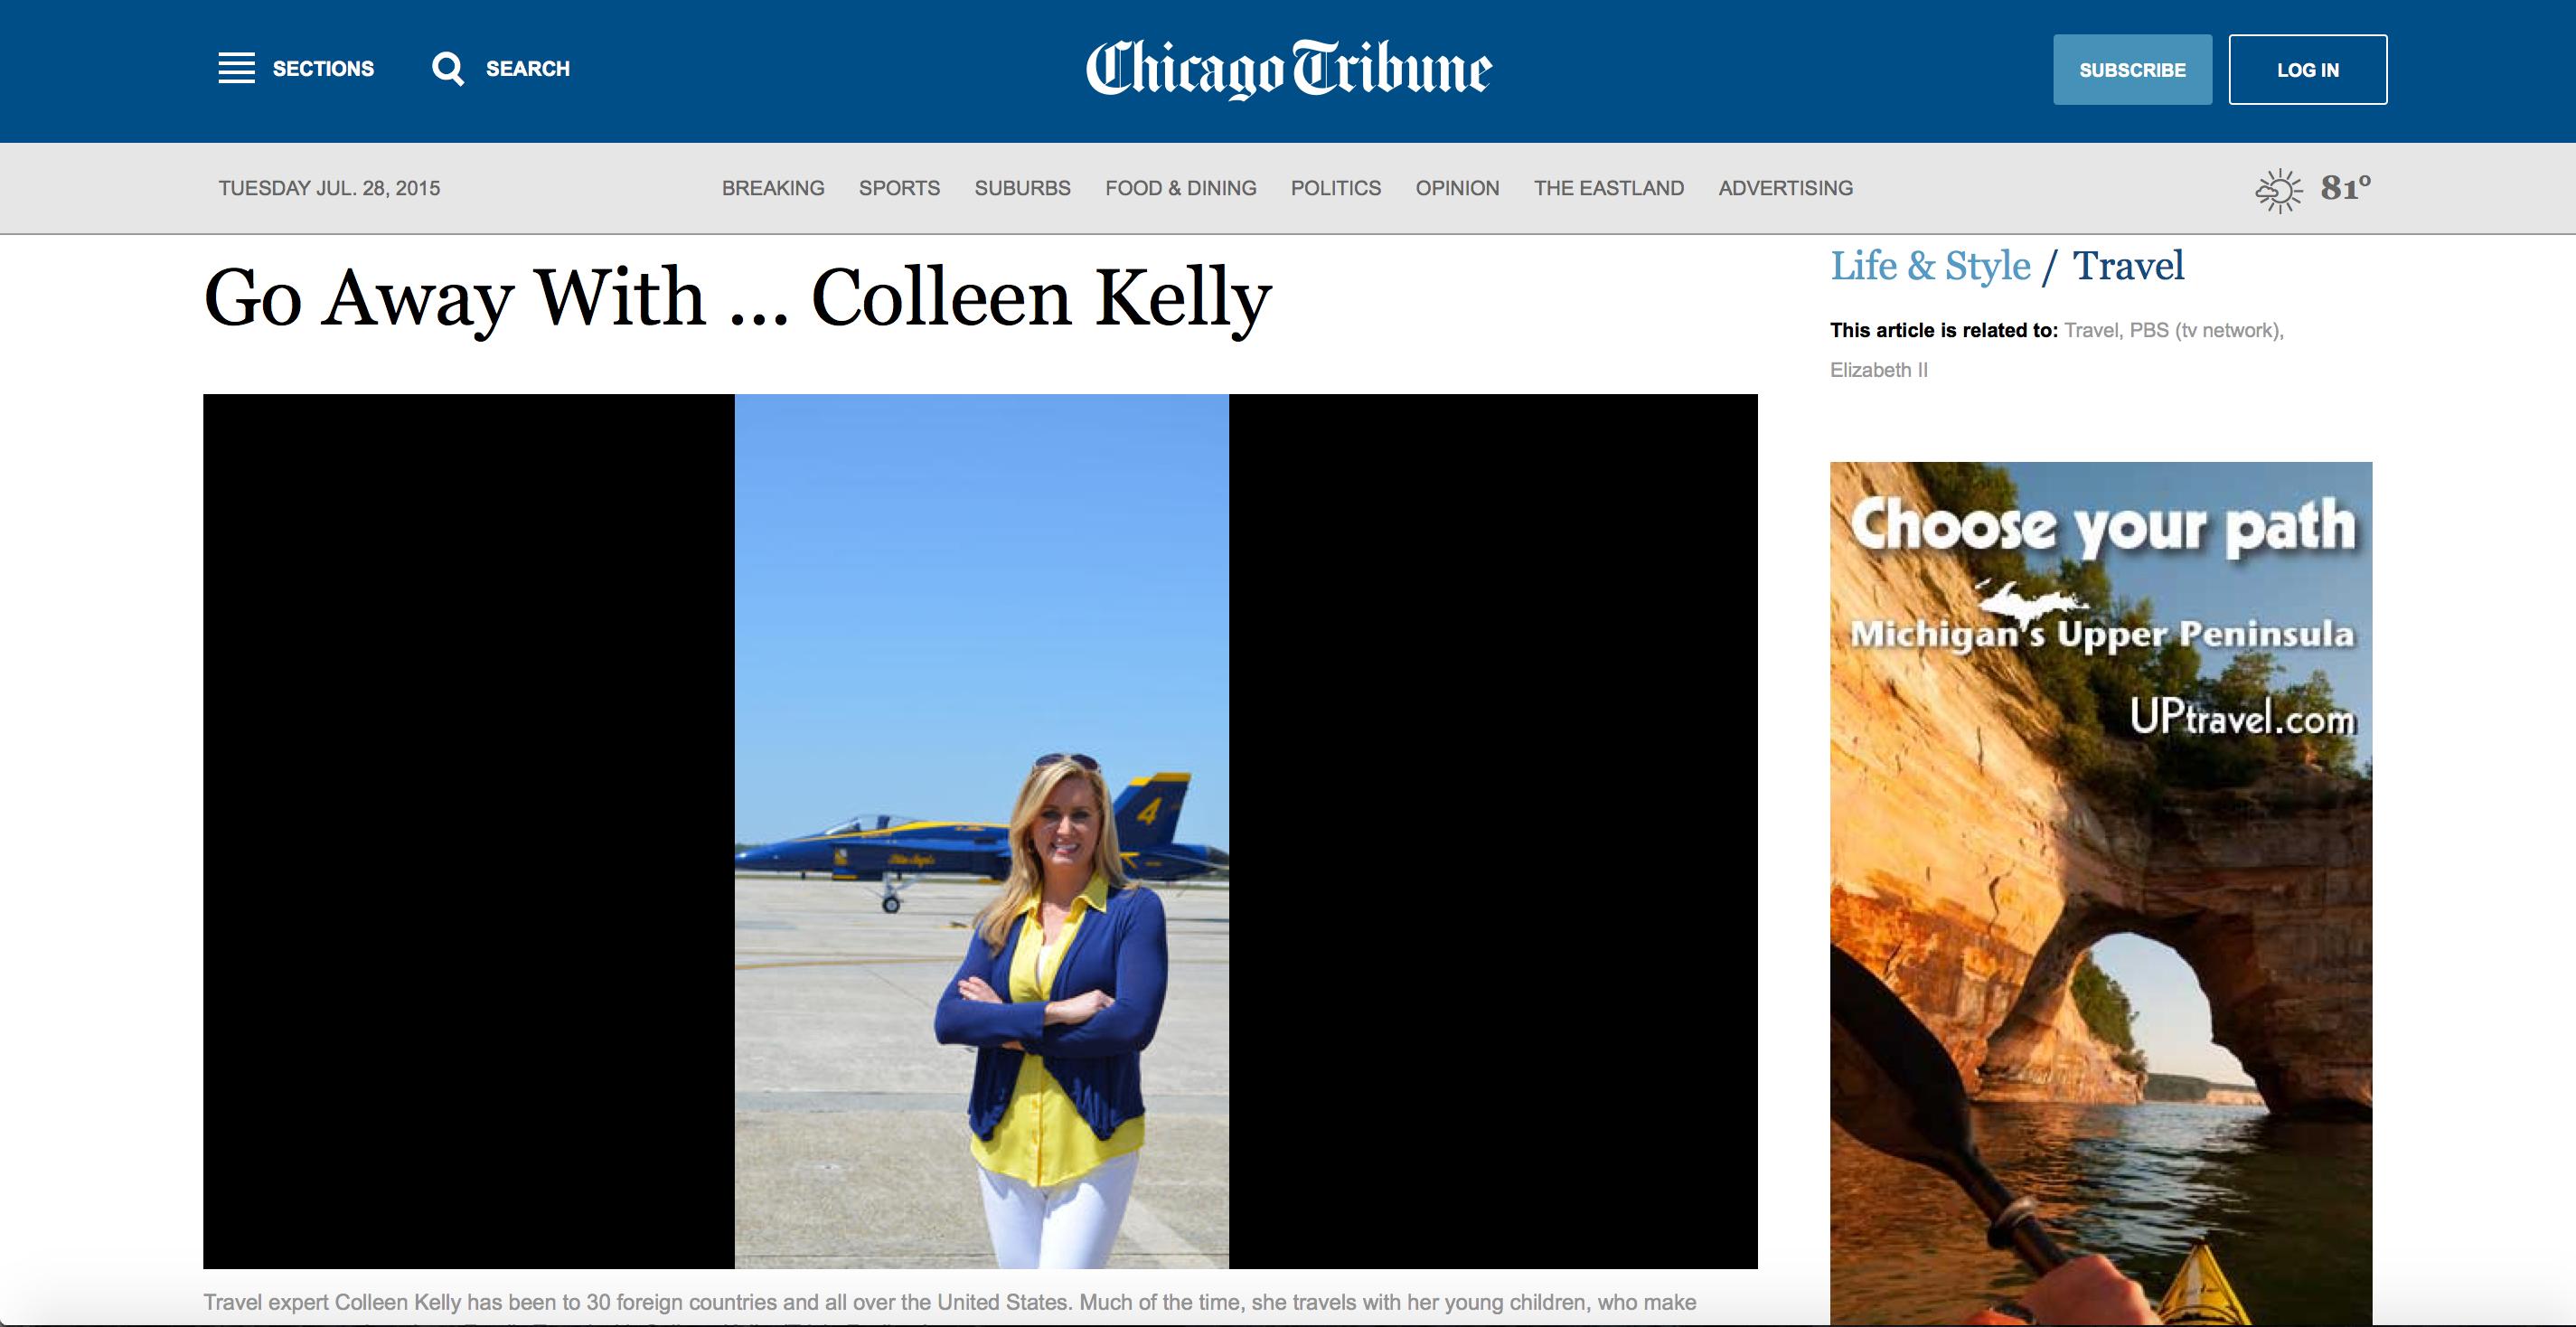 Chicago Tribune: Go Away With…